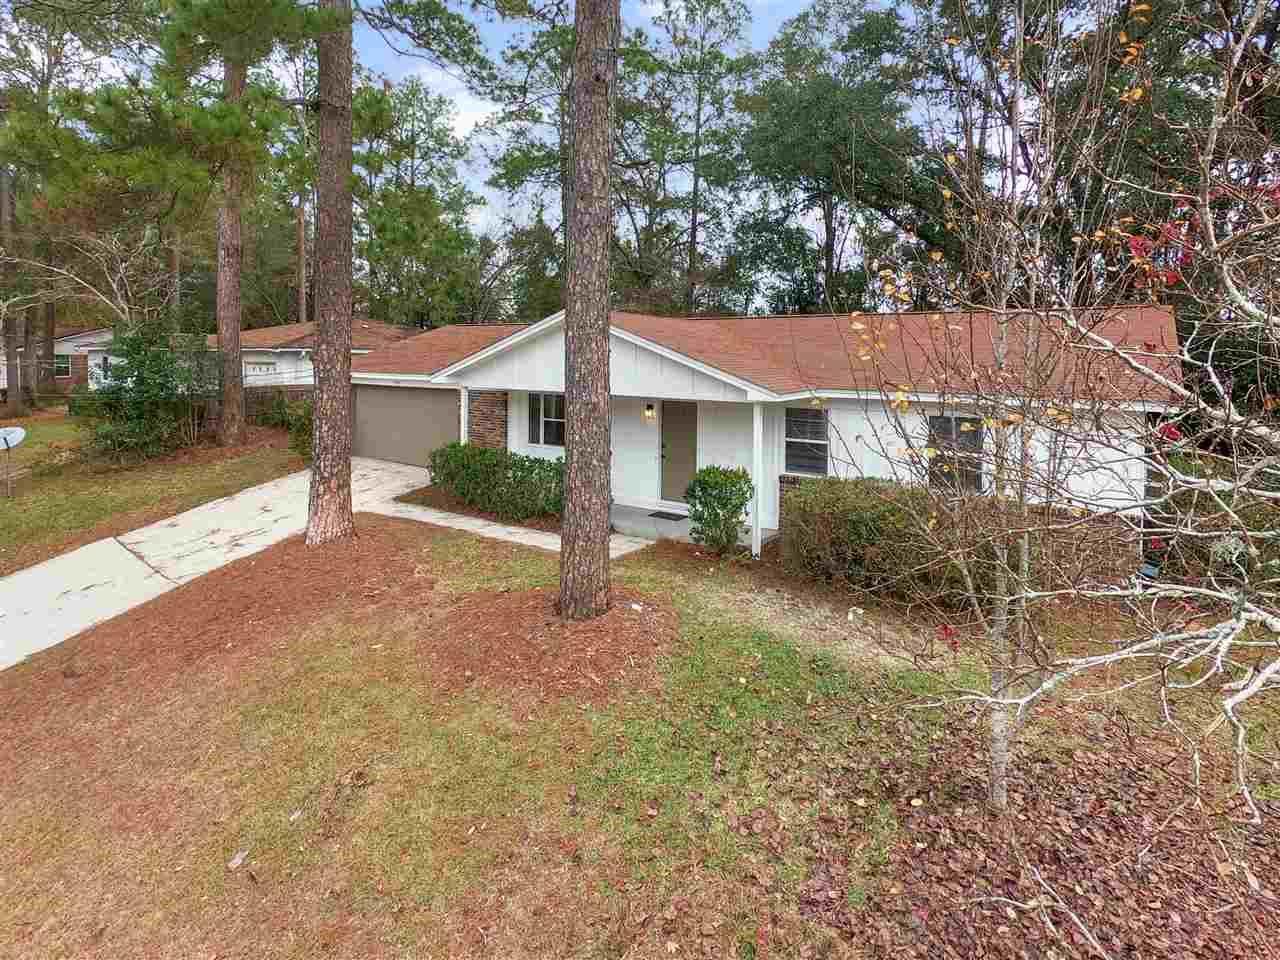 Photo of 1555 Pine View Drive, TALLAHASSEE, FL 32301 (MLS # 326973)